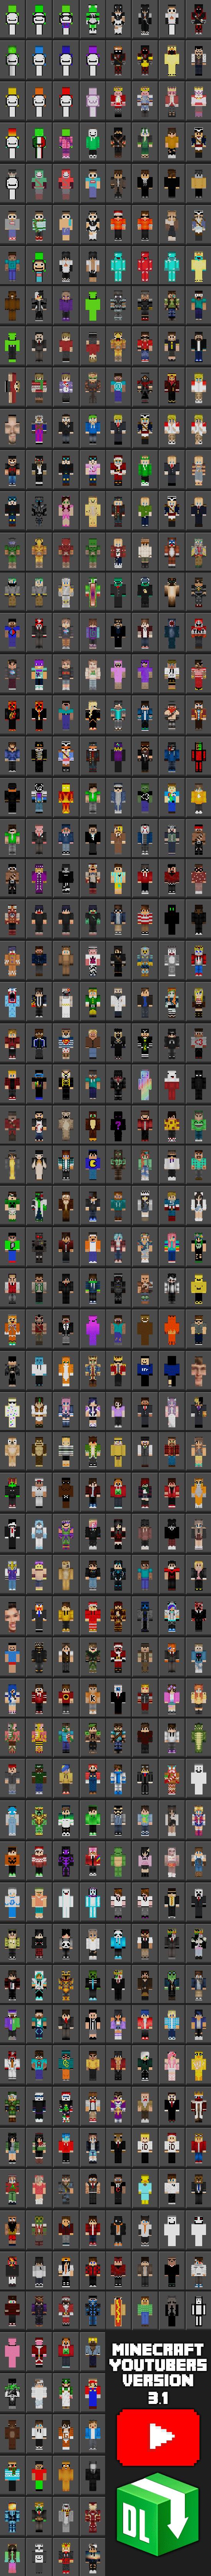 Minecraft YouTubers 1111.11  Minecraft Skin Packs